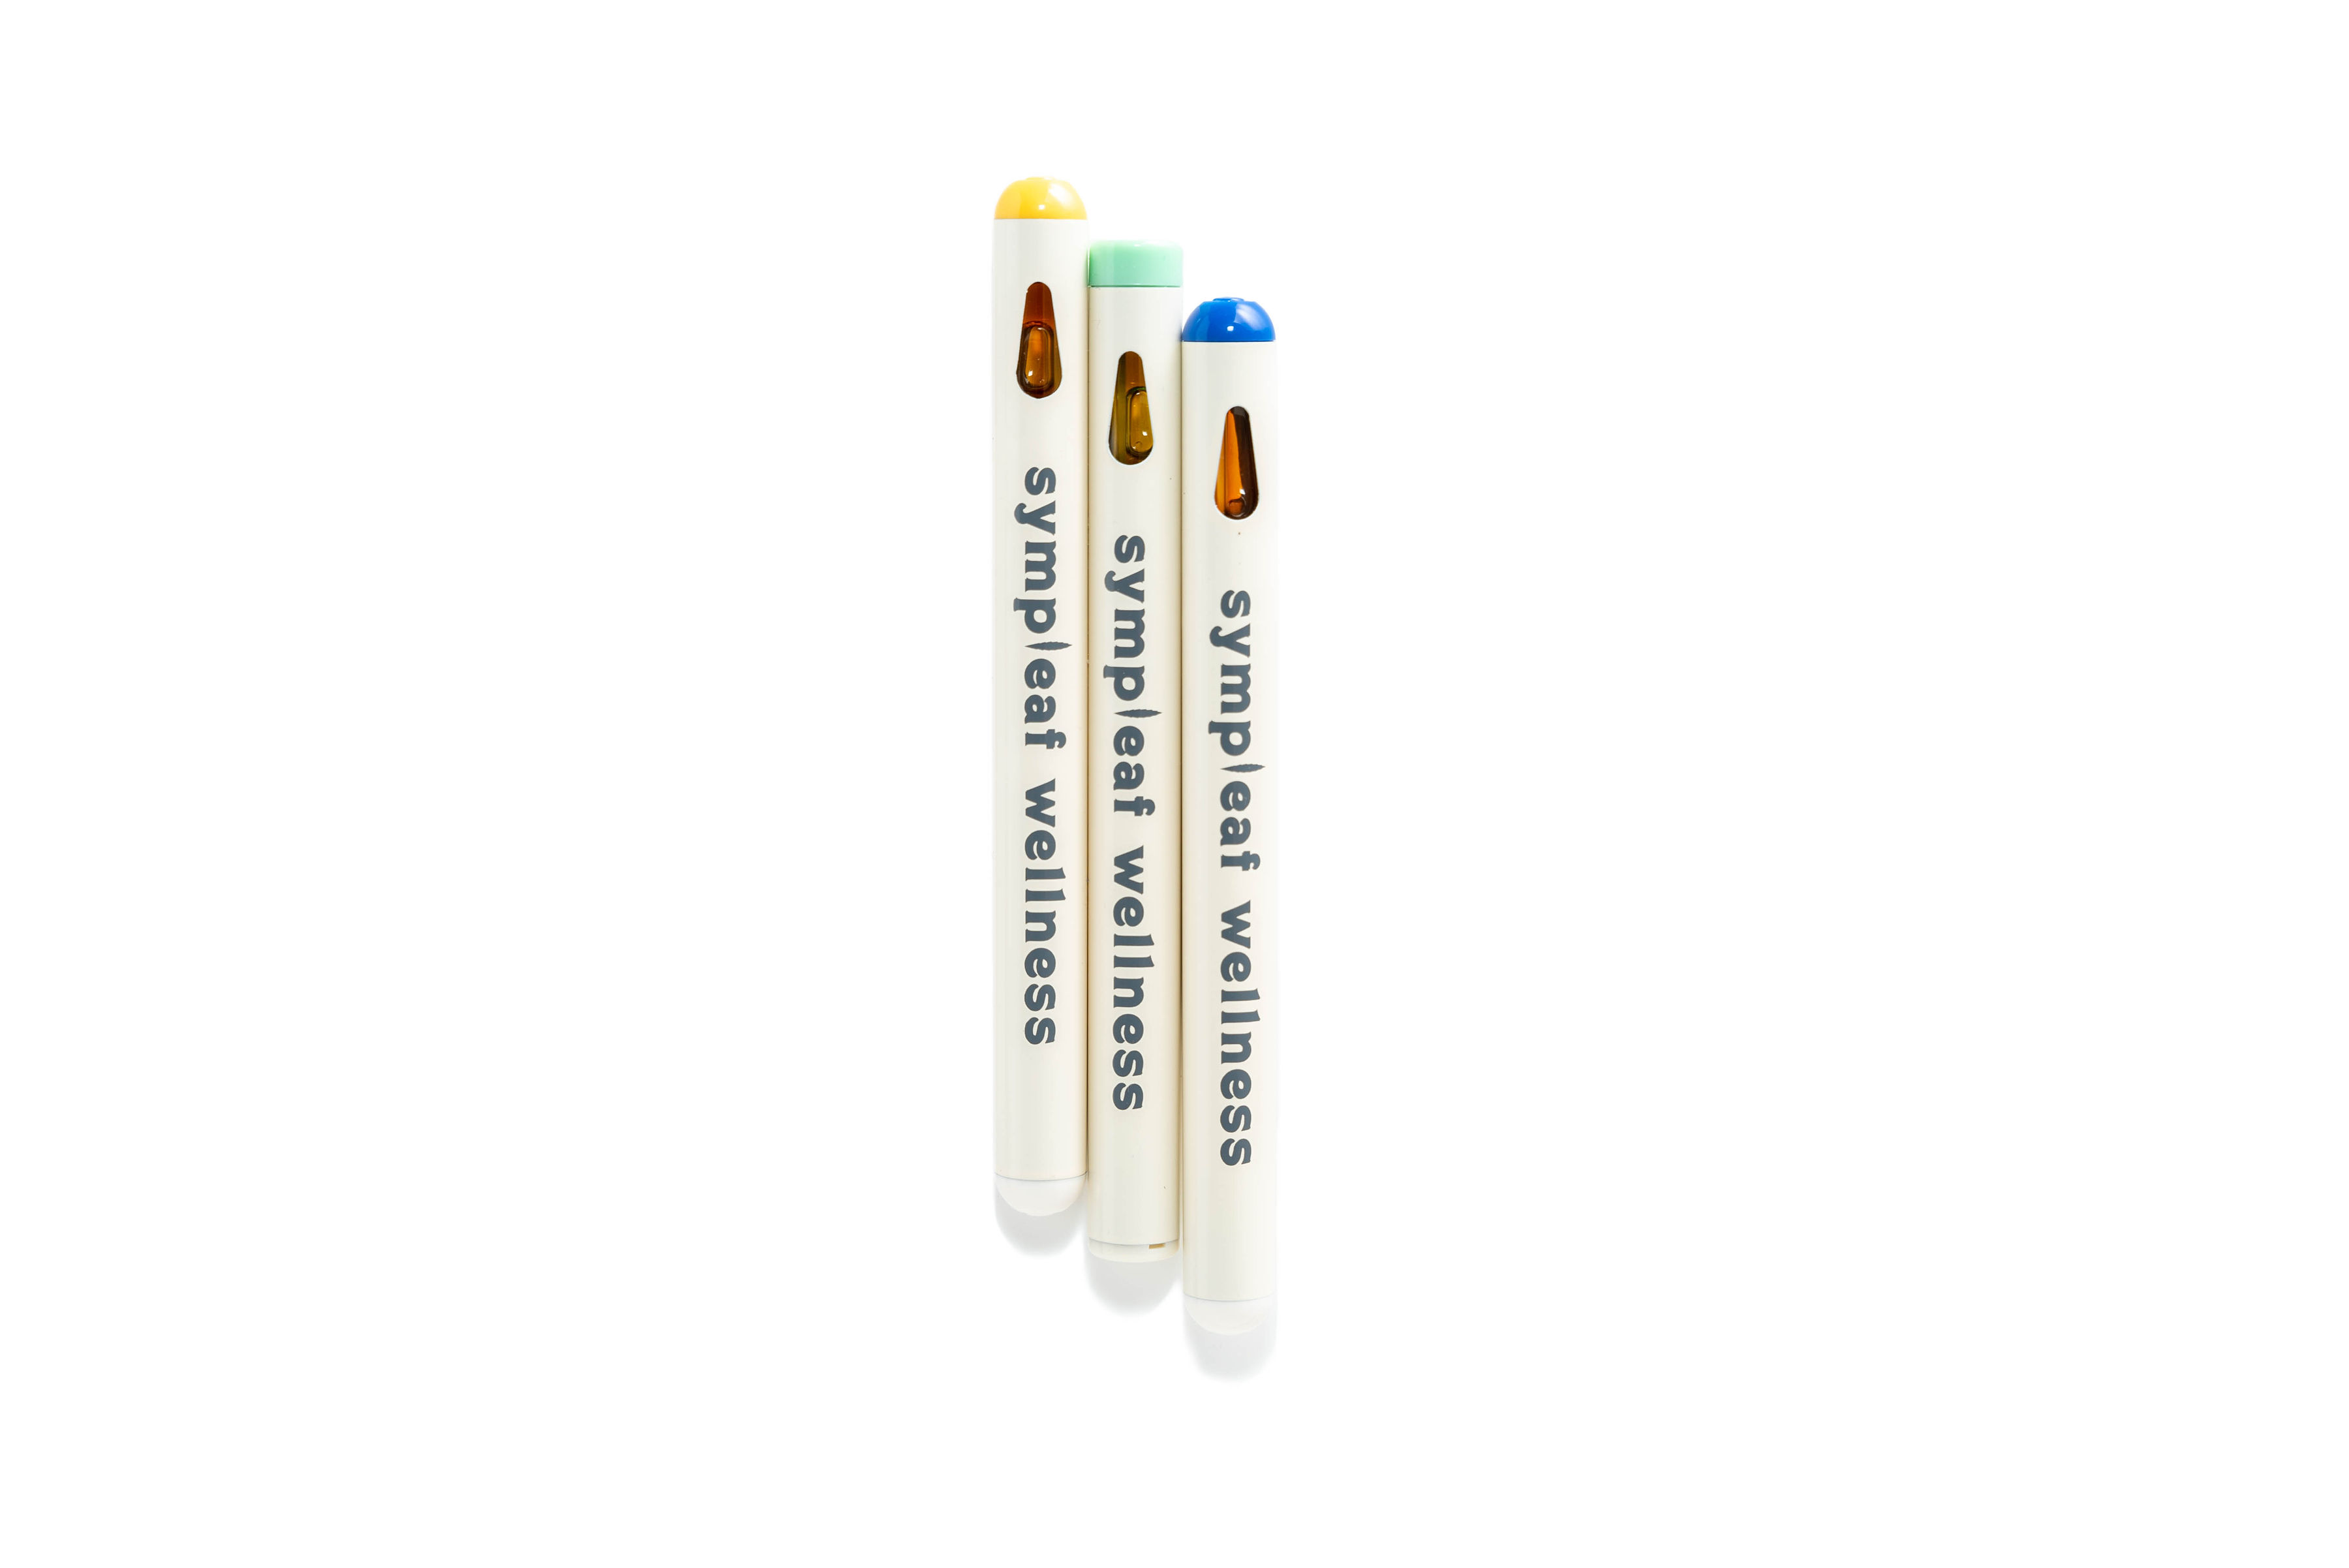 Sympleaf Wellness CBD Aromatherapy Terpene Kit (3 ct) – 200mg CBD per unit